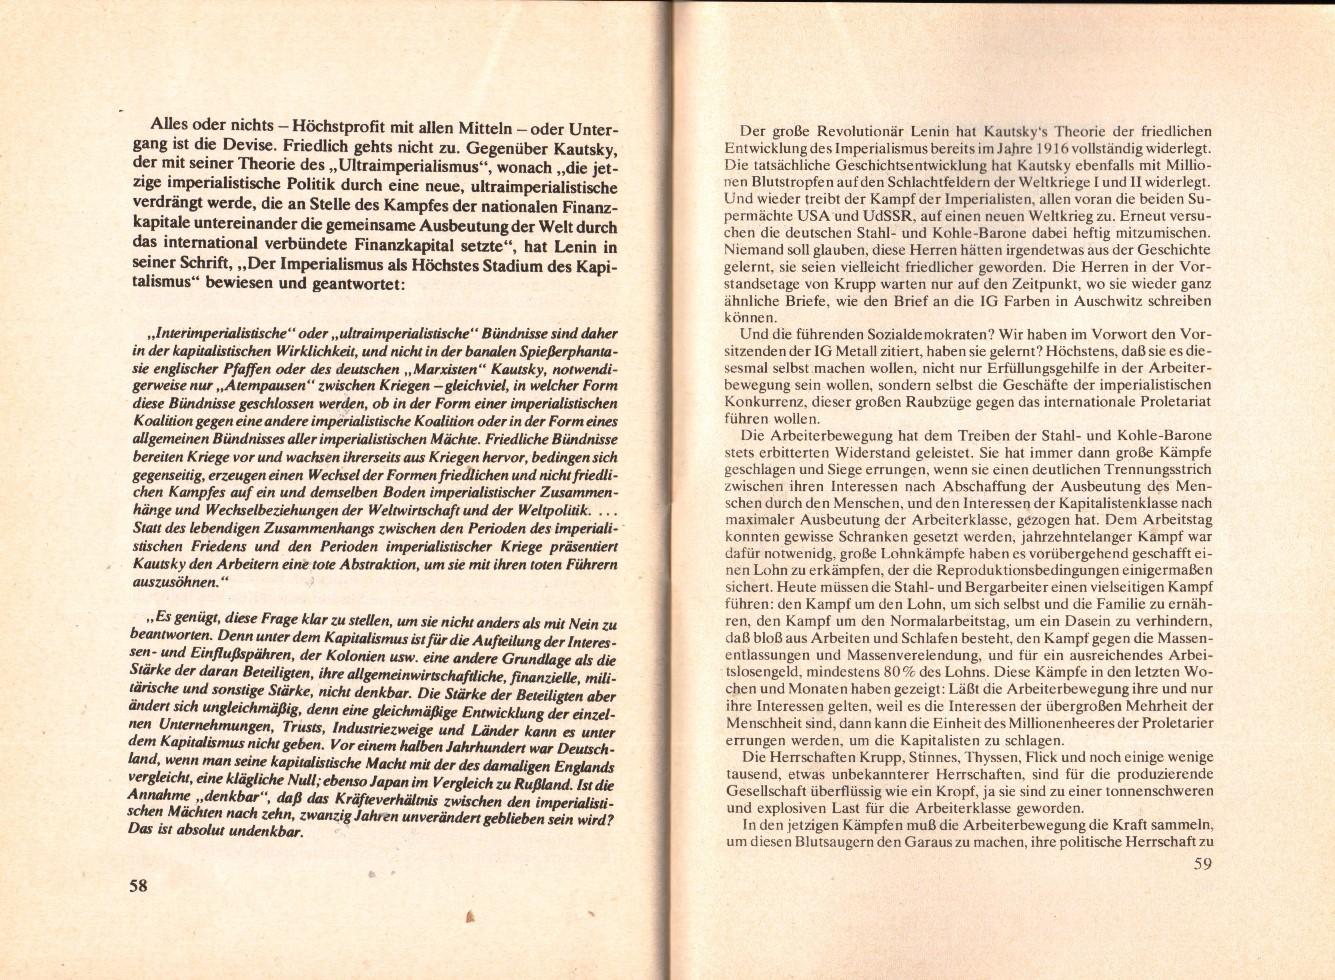 NRW_KBW_1977_Politik_der_Kohle_u_Stahlbarone_31